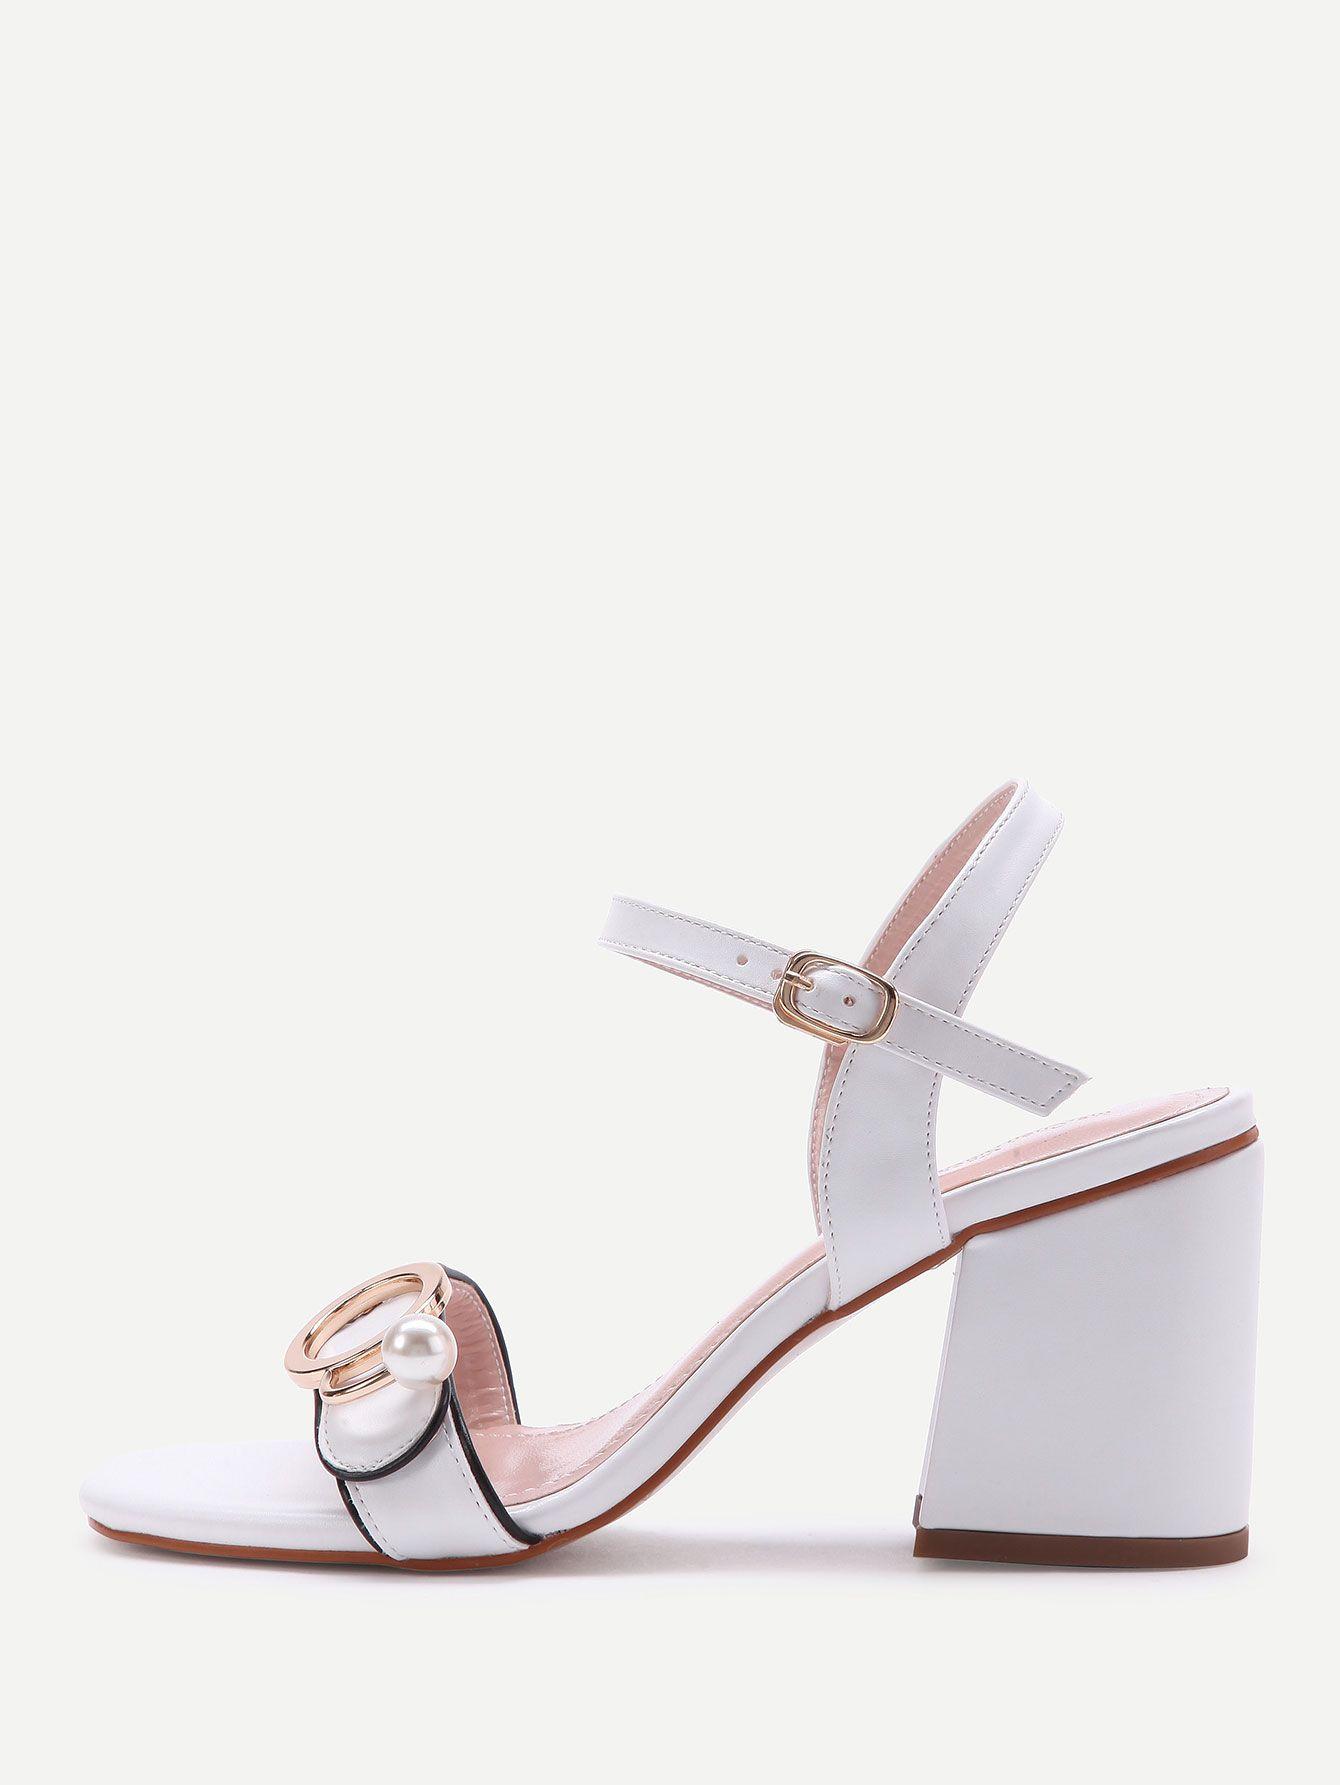 cd0d2466352f6 Shop Metal Buckle Block Heels Sandals With Faux Pearl online. SheIn offers  Metal Buckle Block